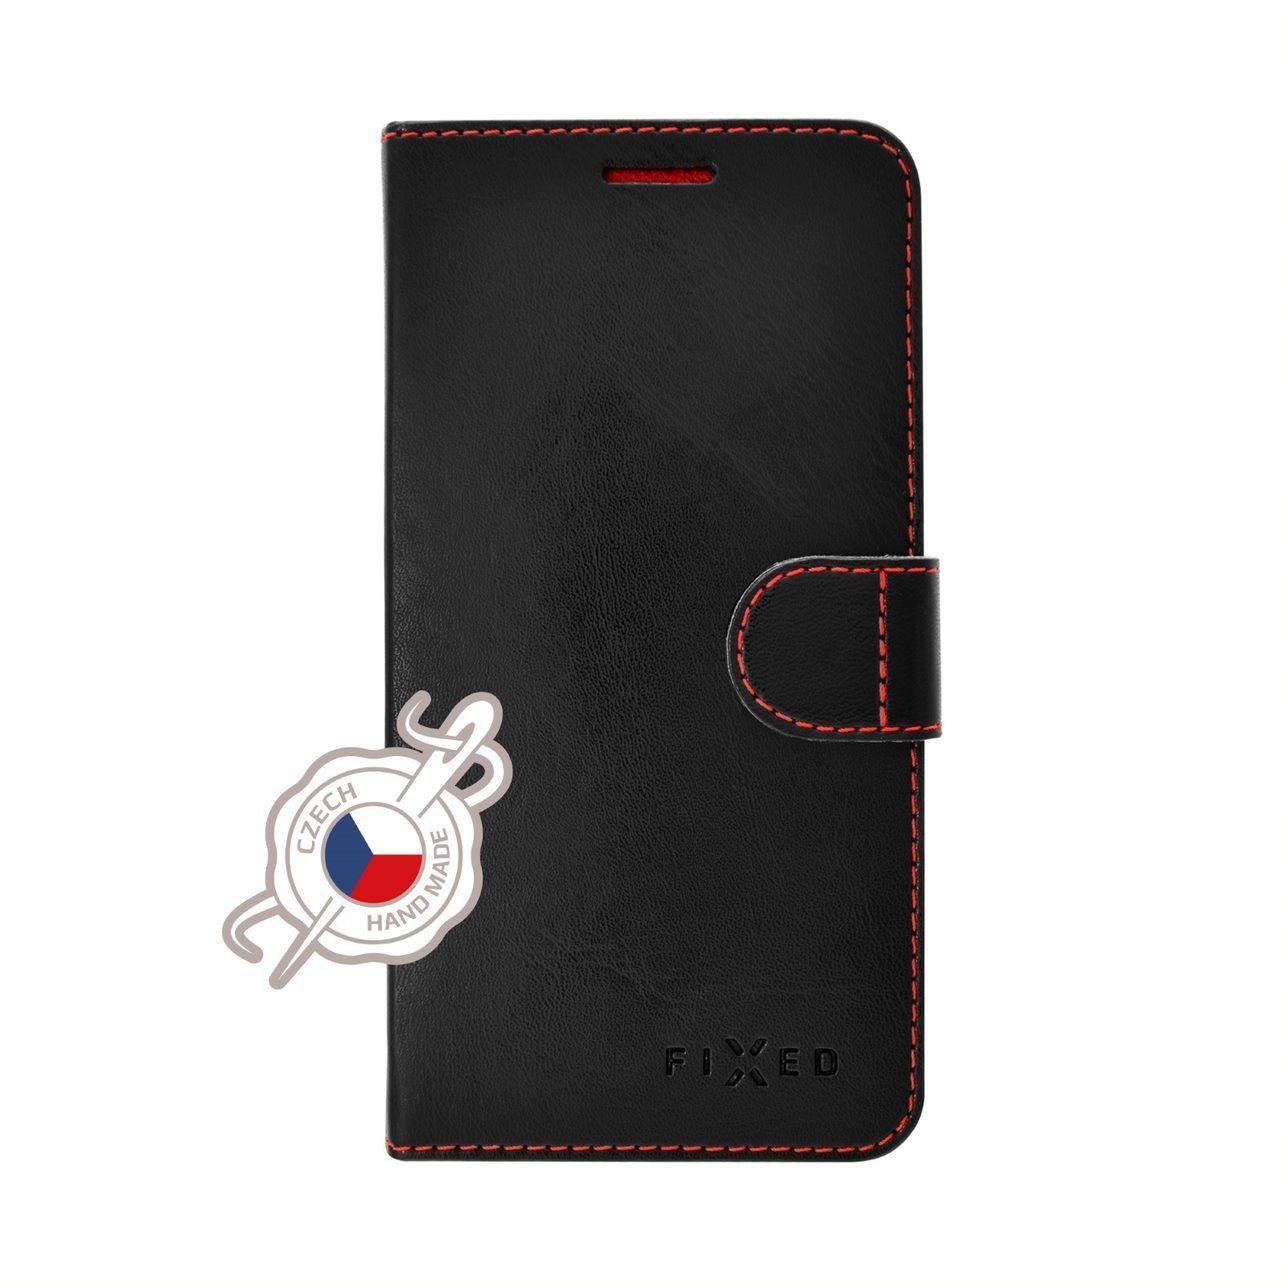 Pouzdro typu kniha FIXED FIT pro Xiaomi Redmi 5 Global, černé